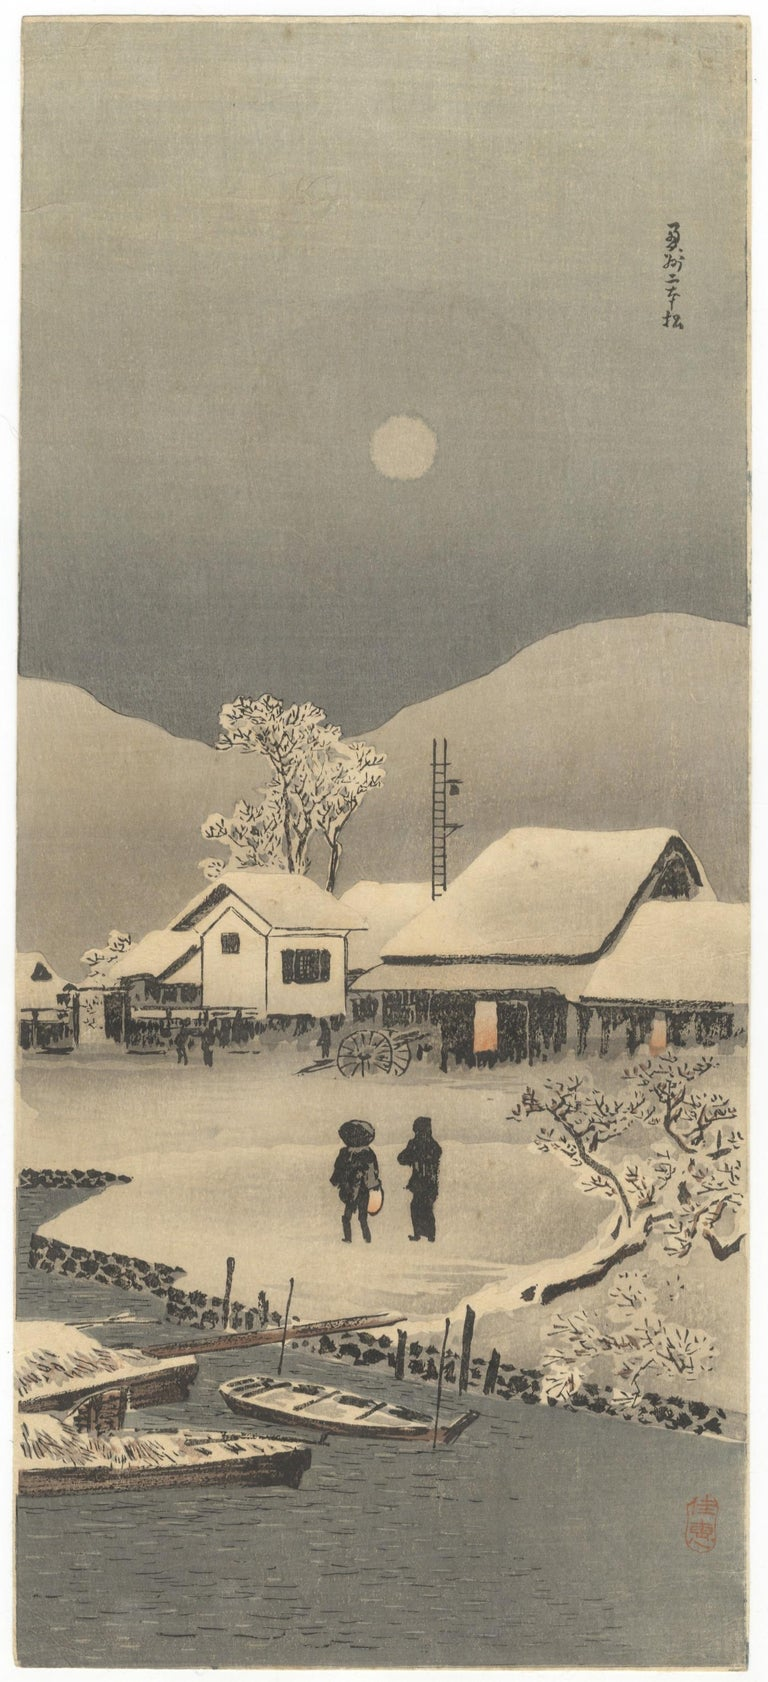 Shotei Takahashi, Snow, Landscape, Shin-Hanga, Original Japanese Woodblock Print - Brown Landscape Print by Shotei Takahashi